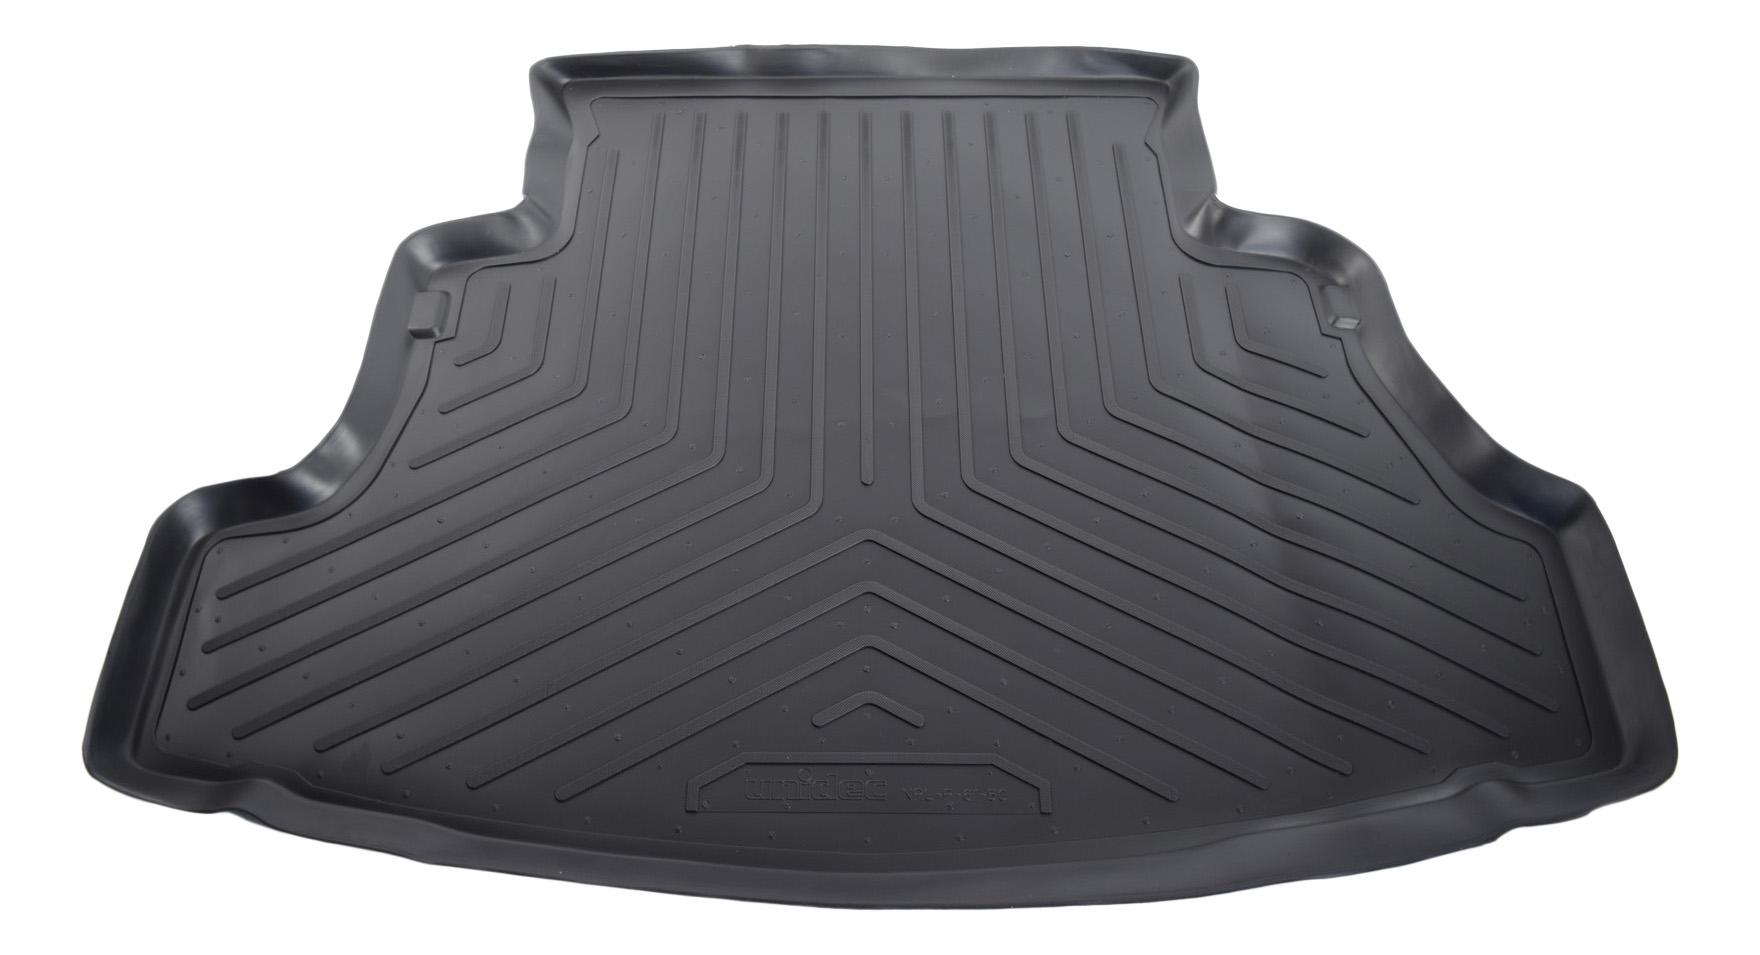 Коврик в багажник автомобиля для Nissan Norplast (NPL-P-61-50) фото